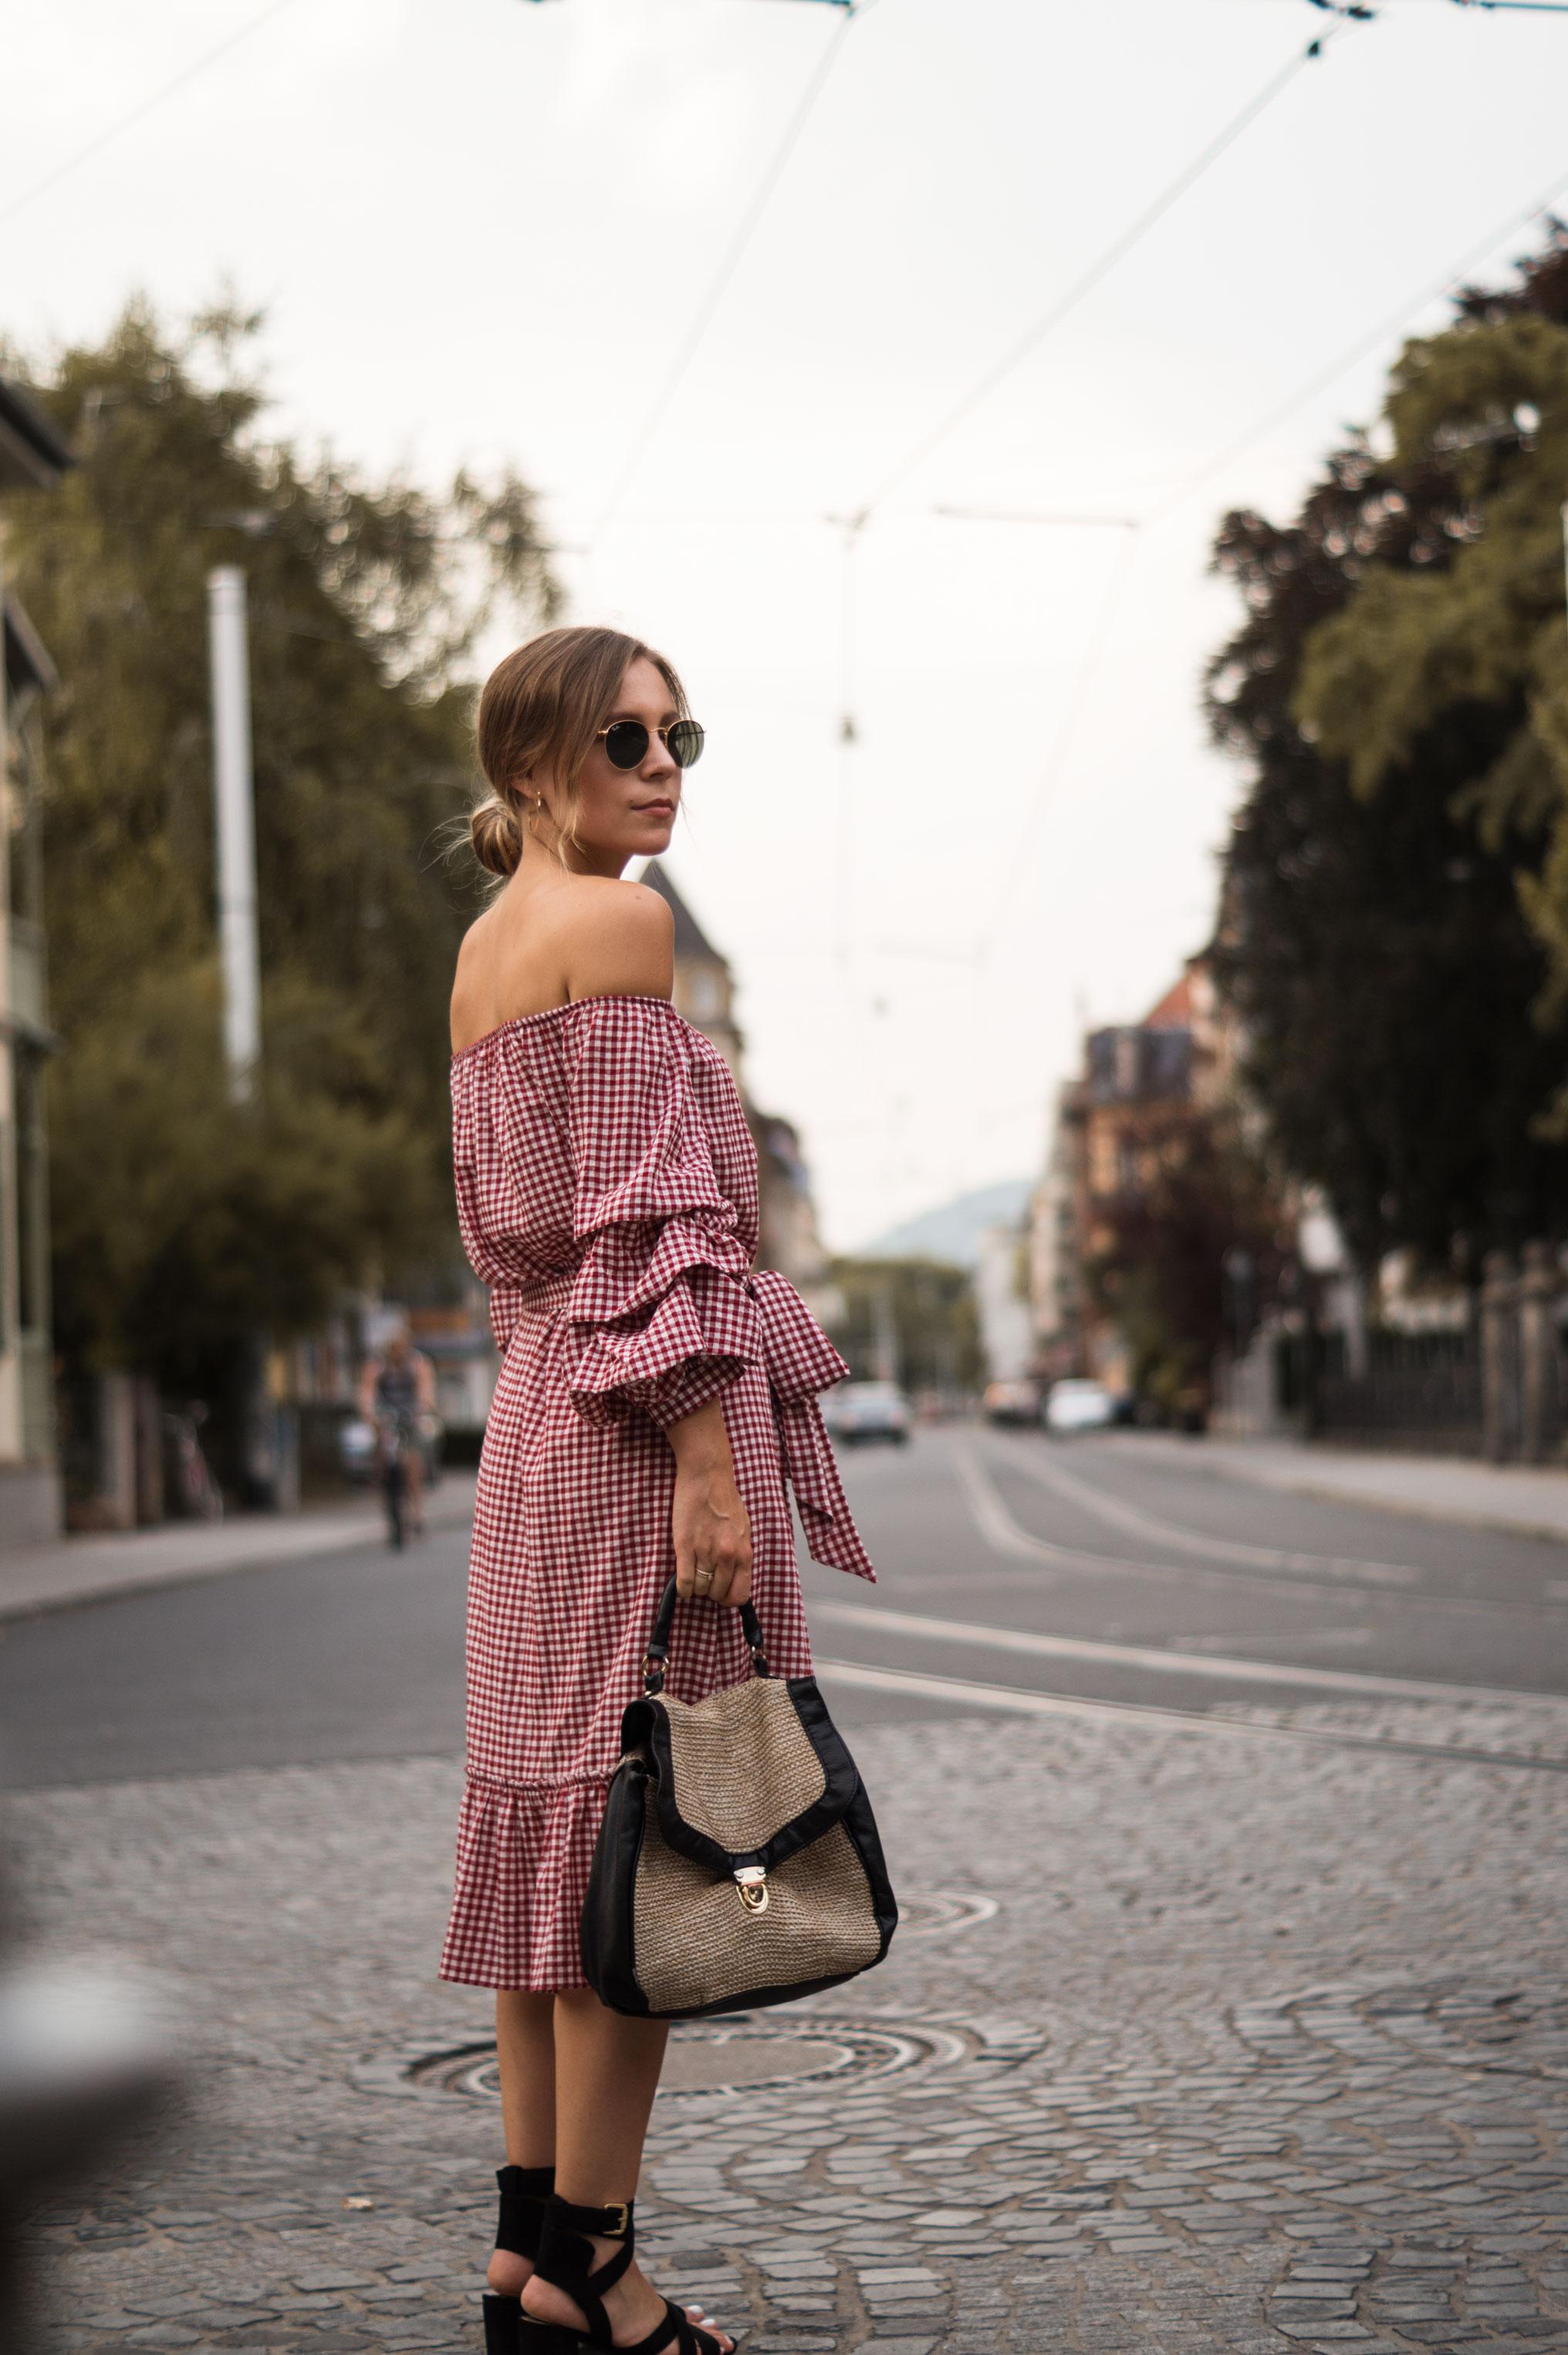 rotes Karokleid Zara off shoulder gingham Streetstyle Heidelberg Sariety Modeblog Fashionblogger-2